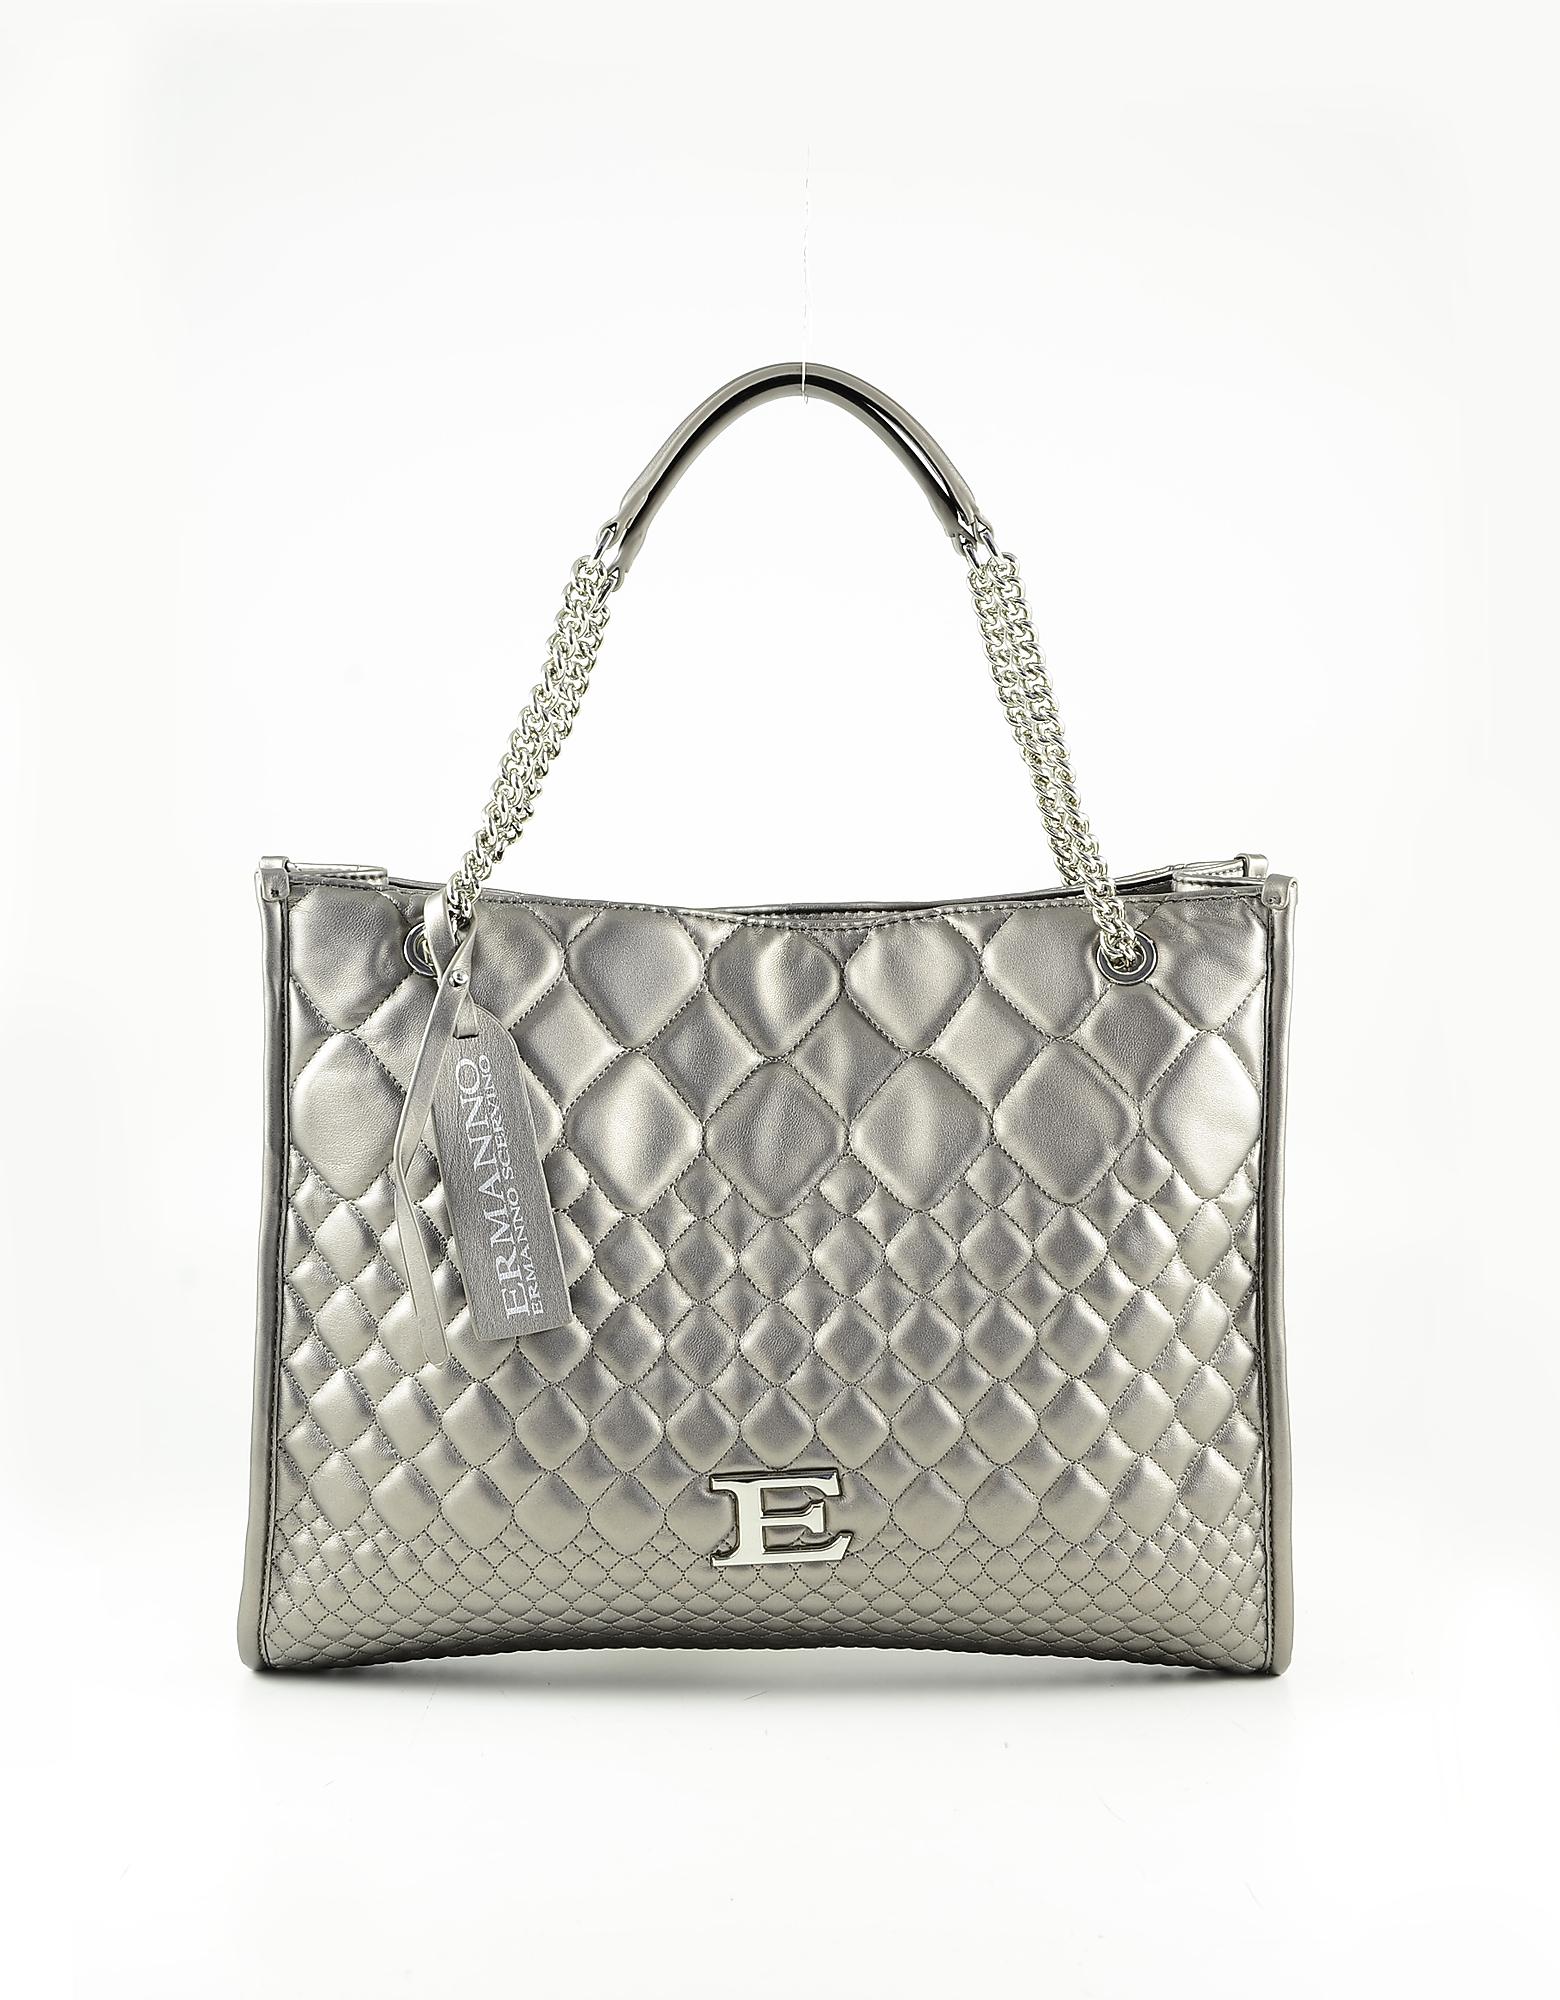 Ermanno Scervino Designer Handbags, Bronze Quilted Eco Leather Tote Bag